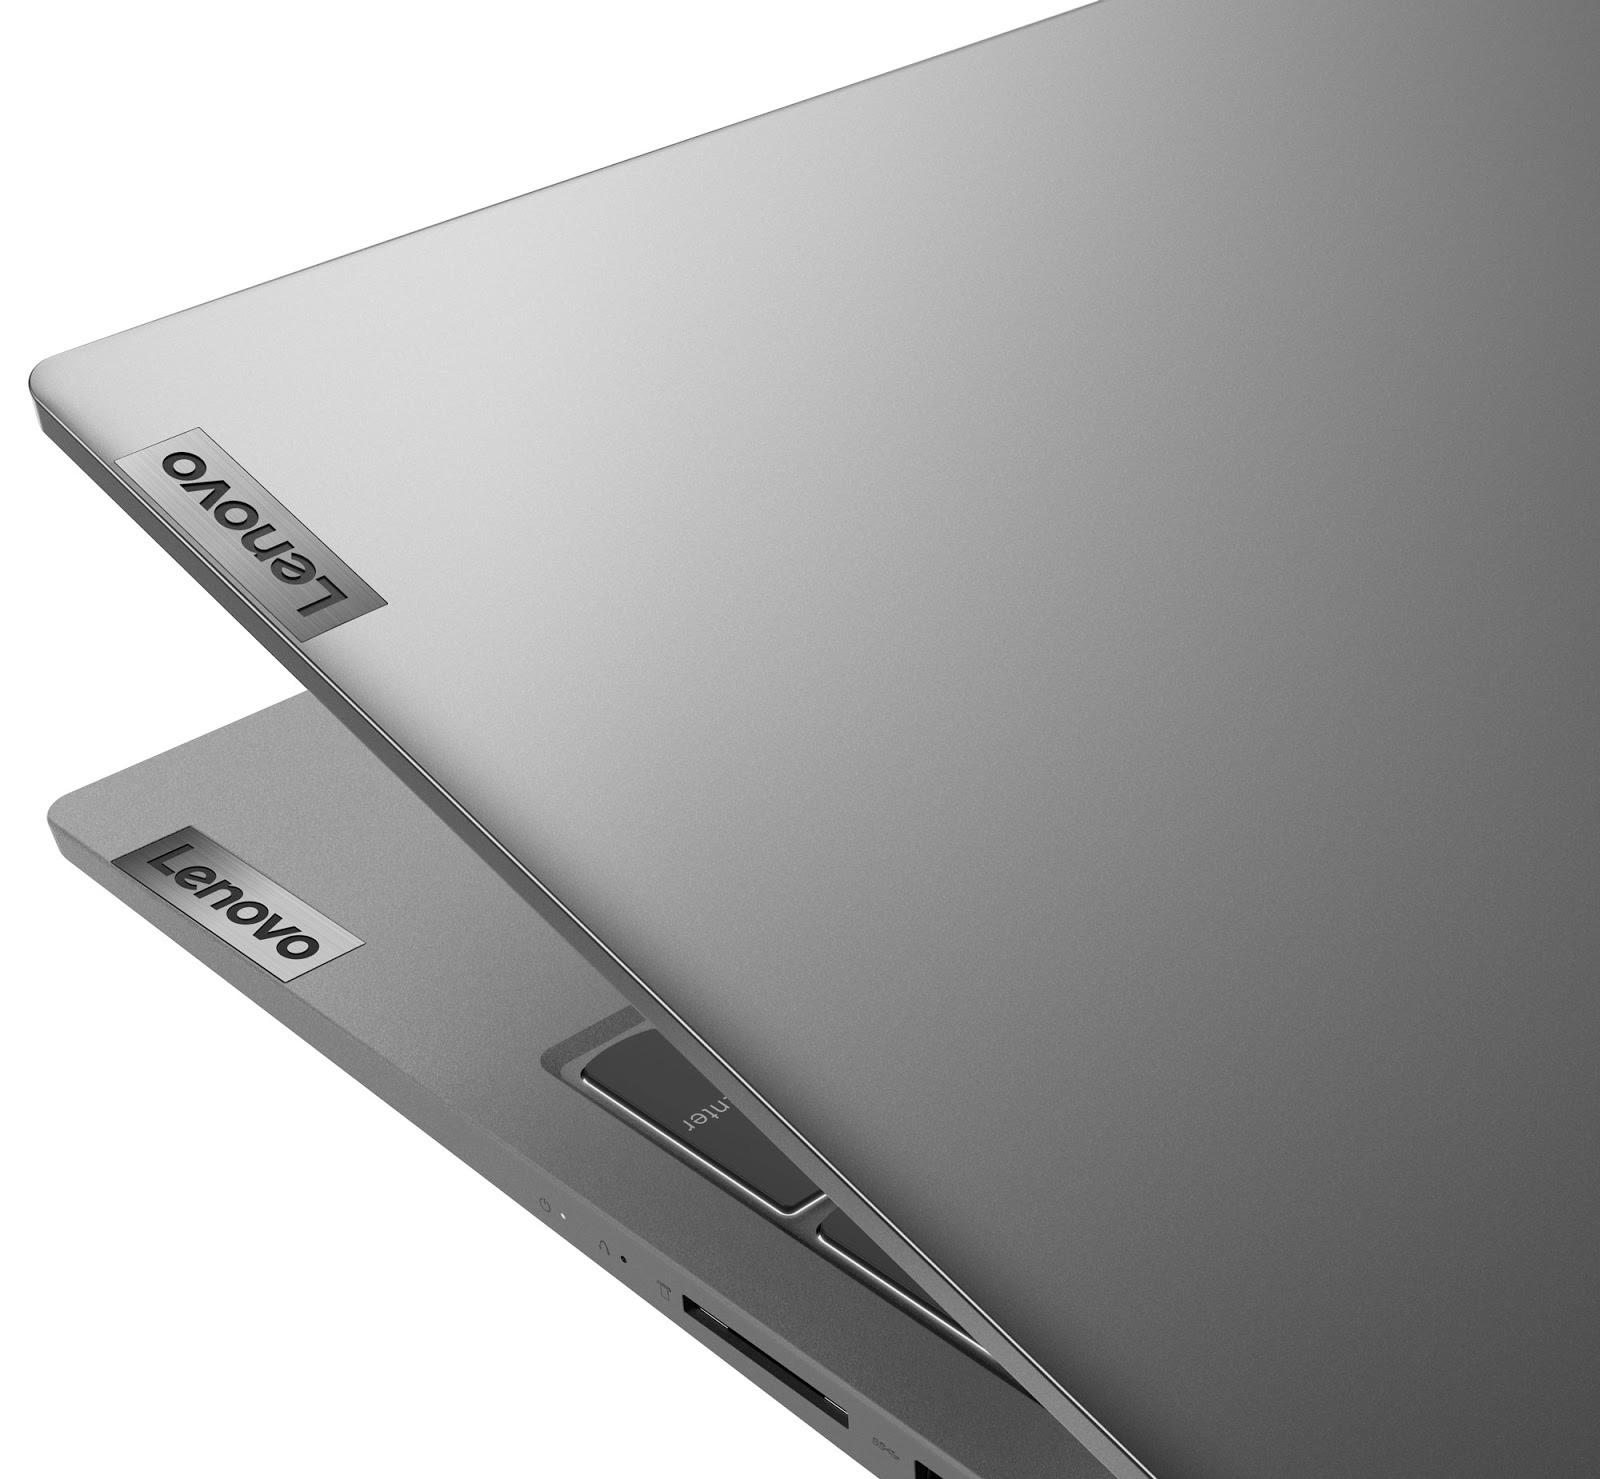 Фото 4. Ноутбук Lenovo ideapad 5 15IIL05 Platinum Grey (81YK00GBRE)